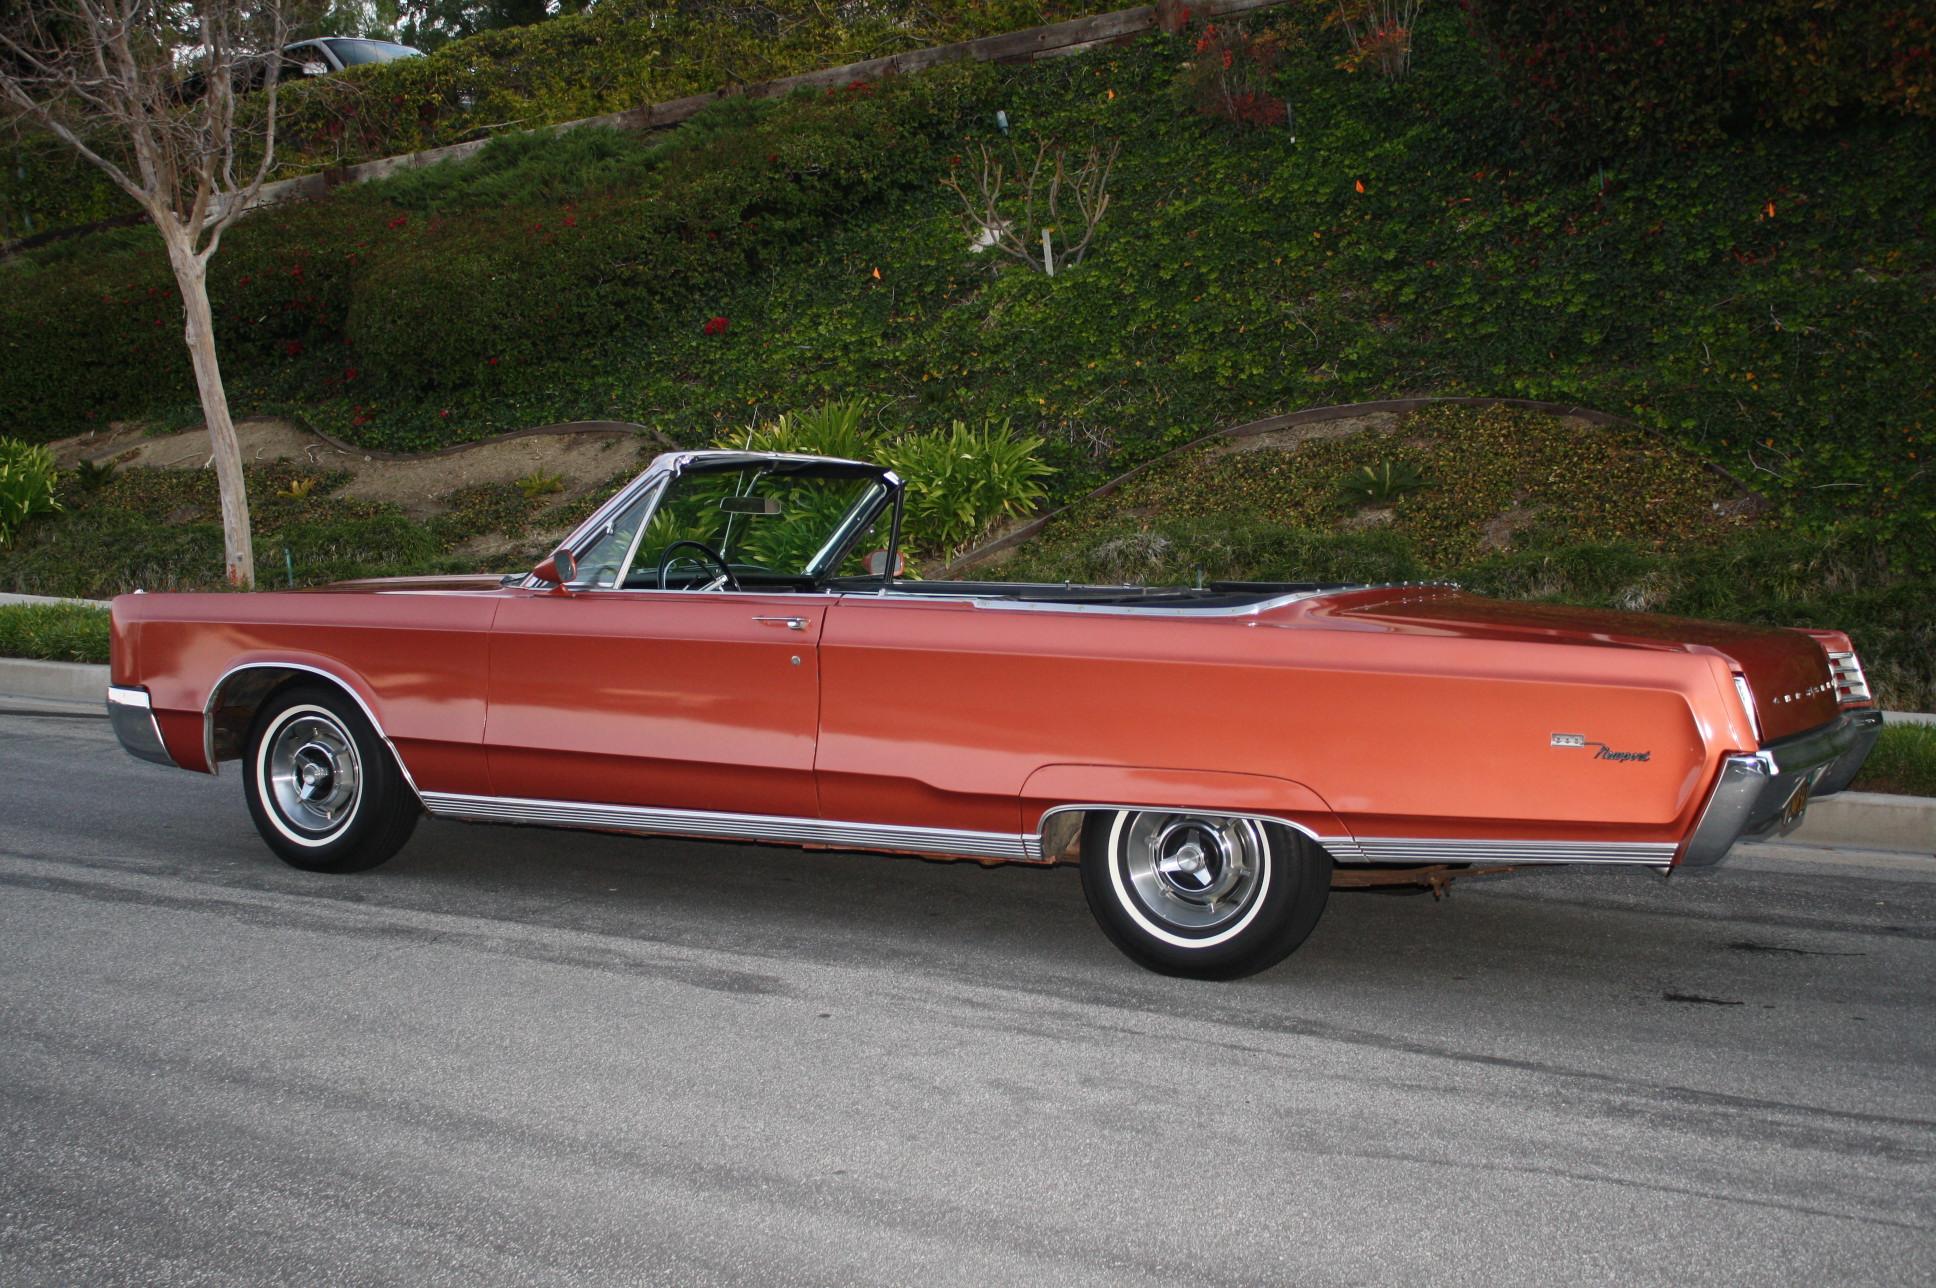 1967 Chrysler Convertible The Vault Classic Cars